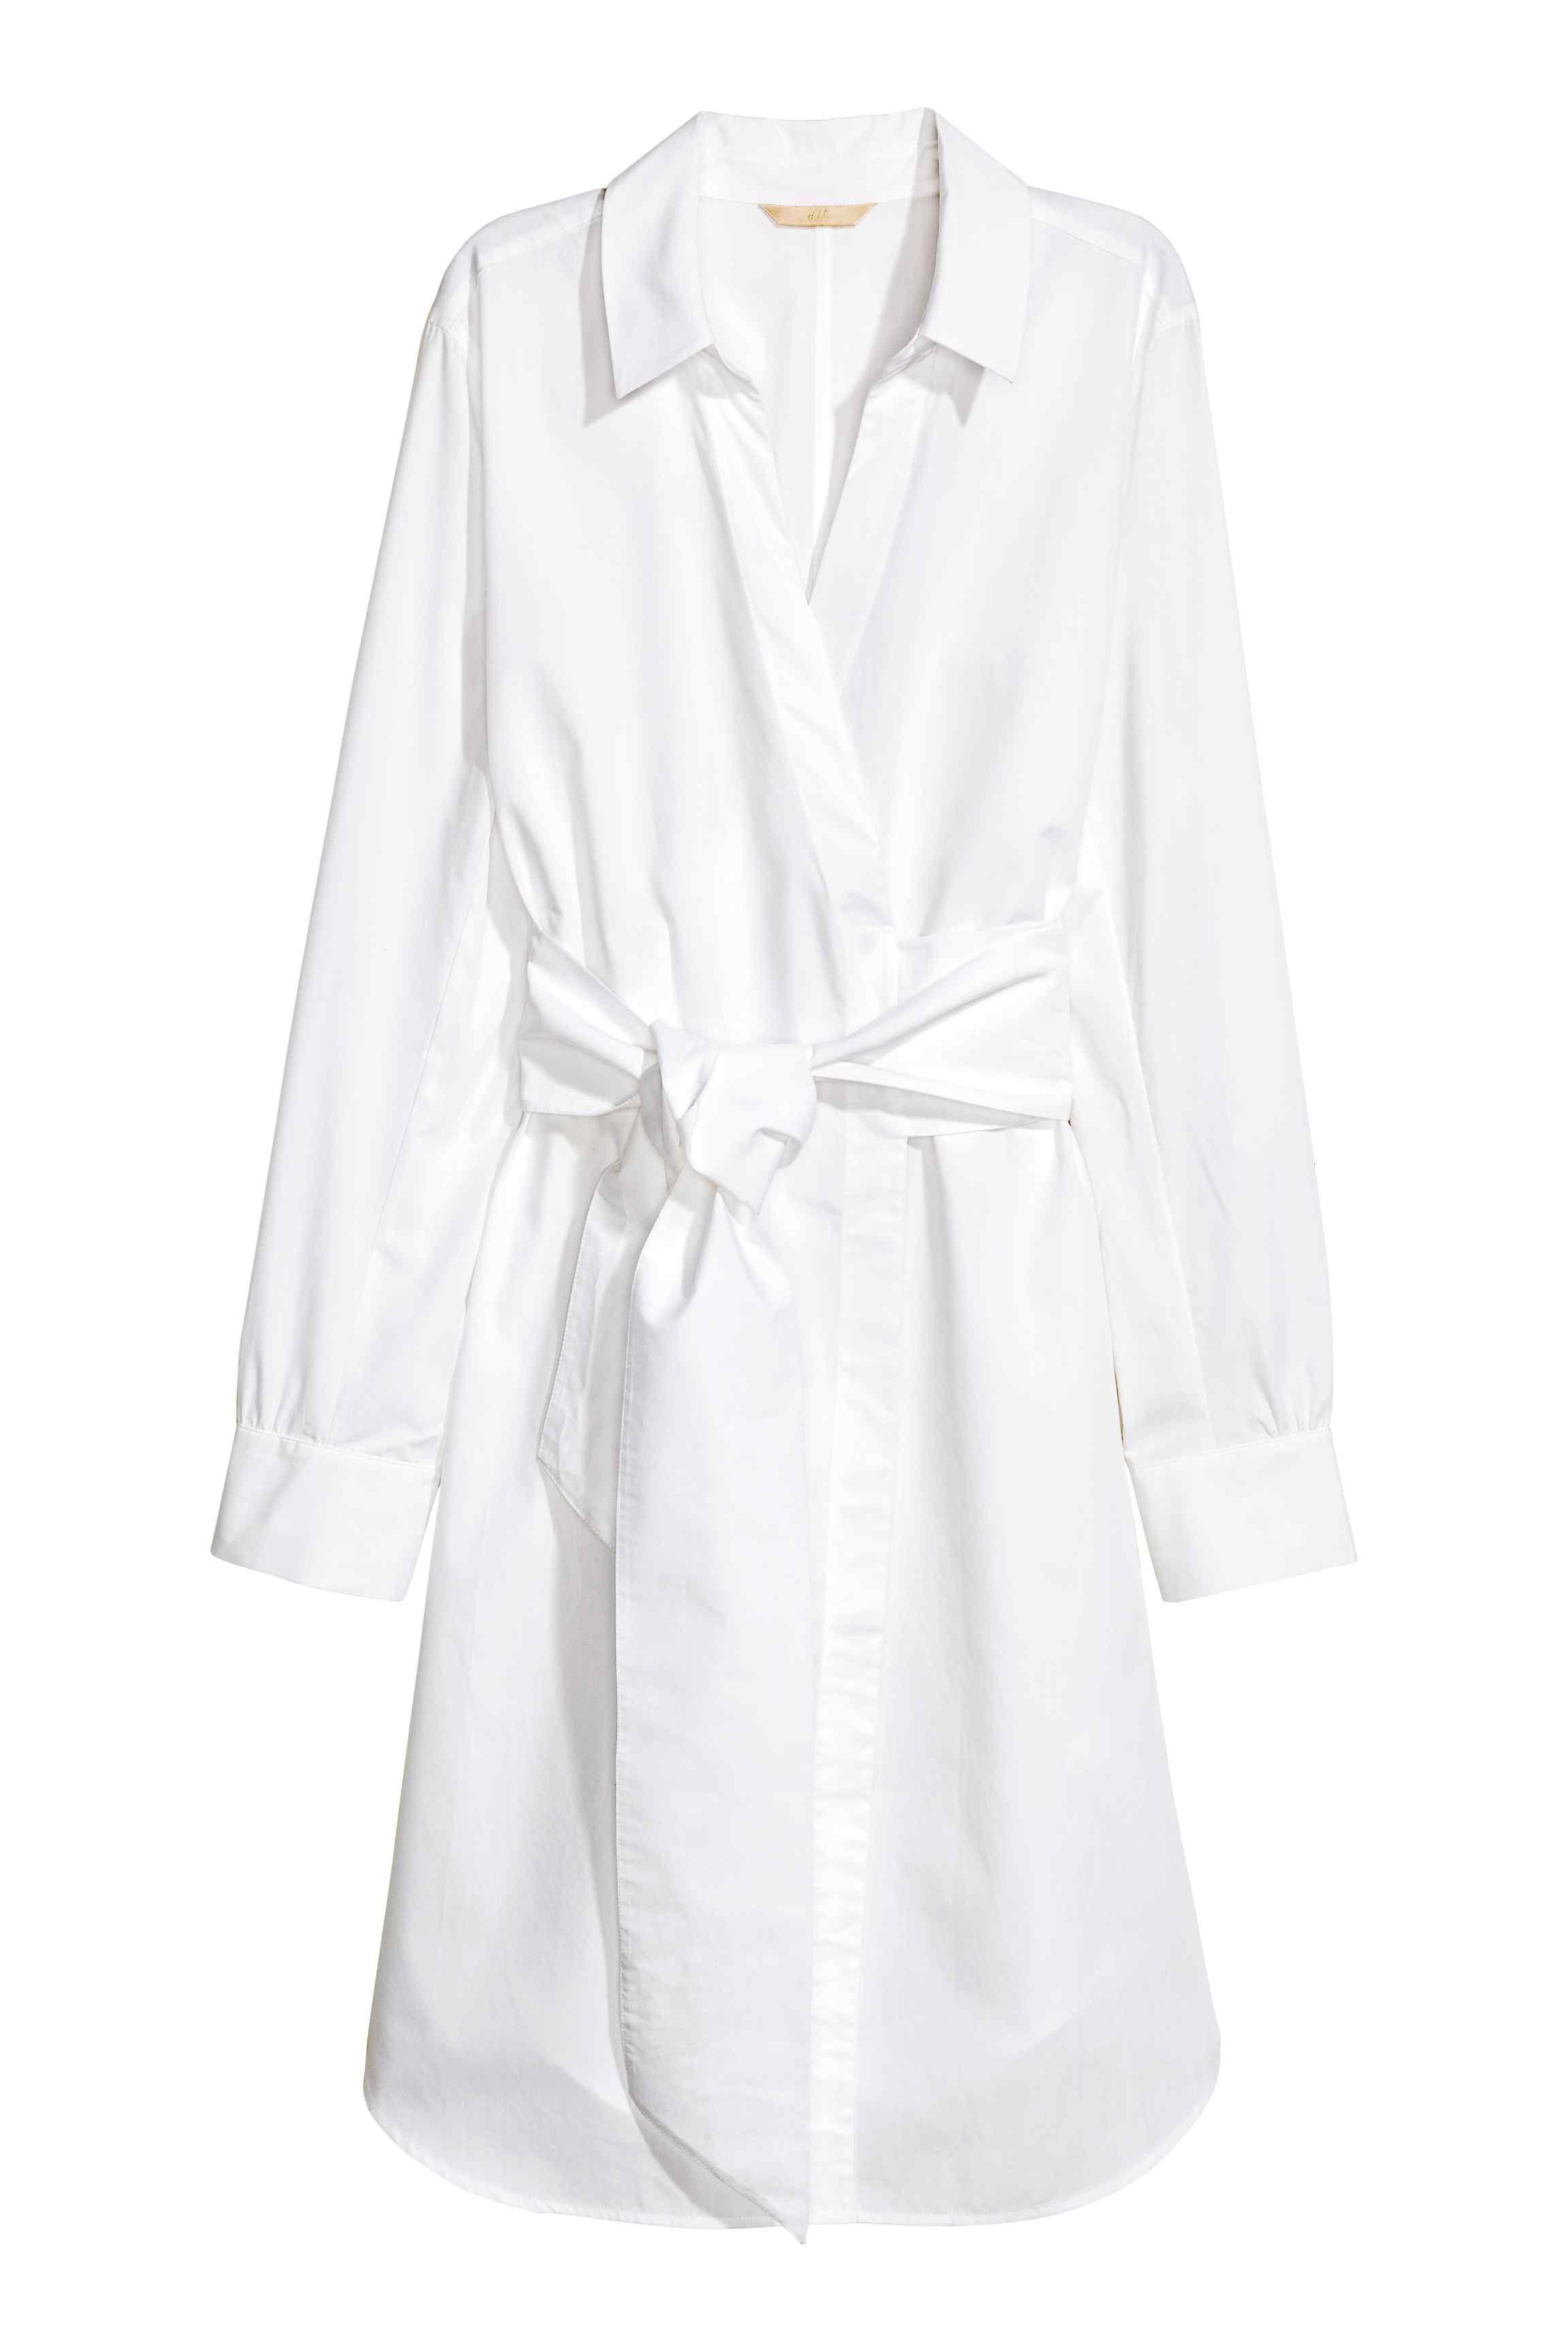 Cotton wrap dress white ladies hum things iull buywear